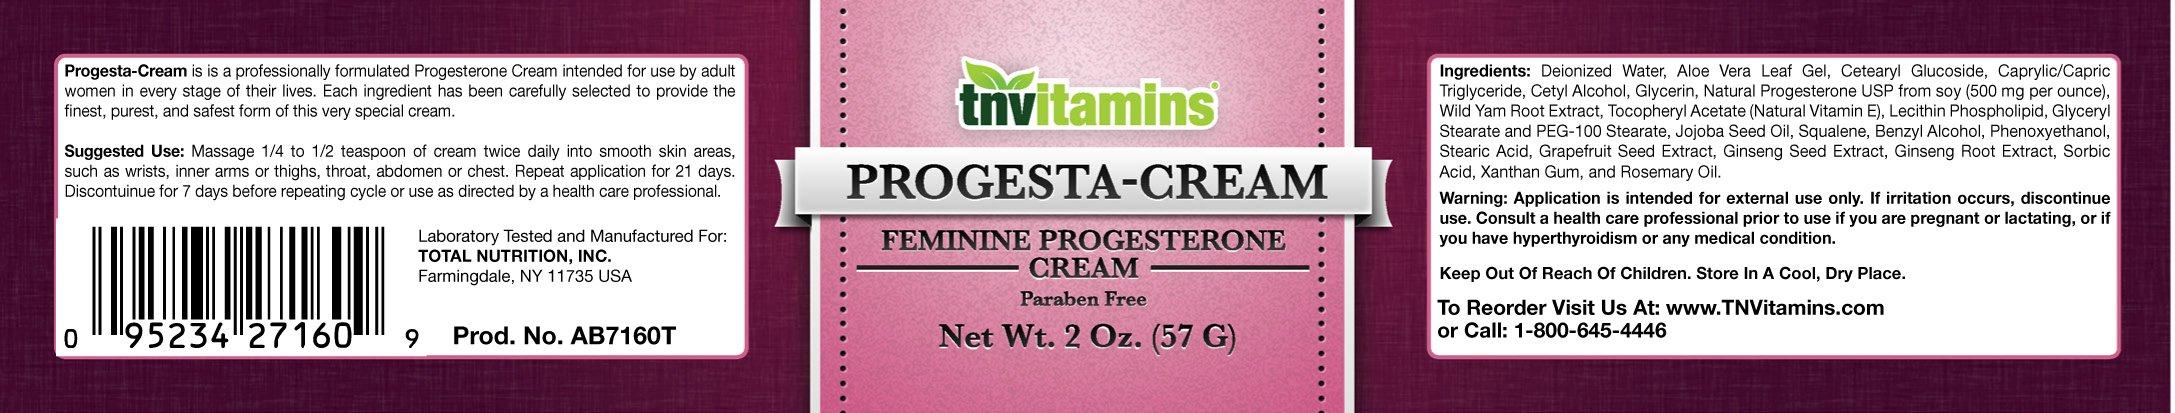 TNVitamins Progesterone Cream- 2 oz by TNVitamins